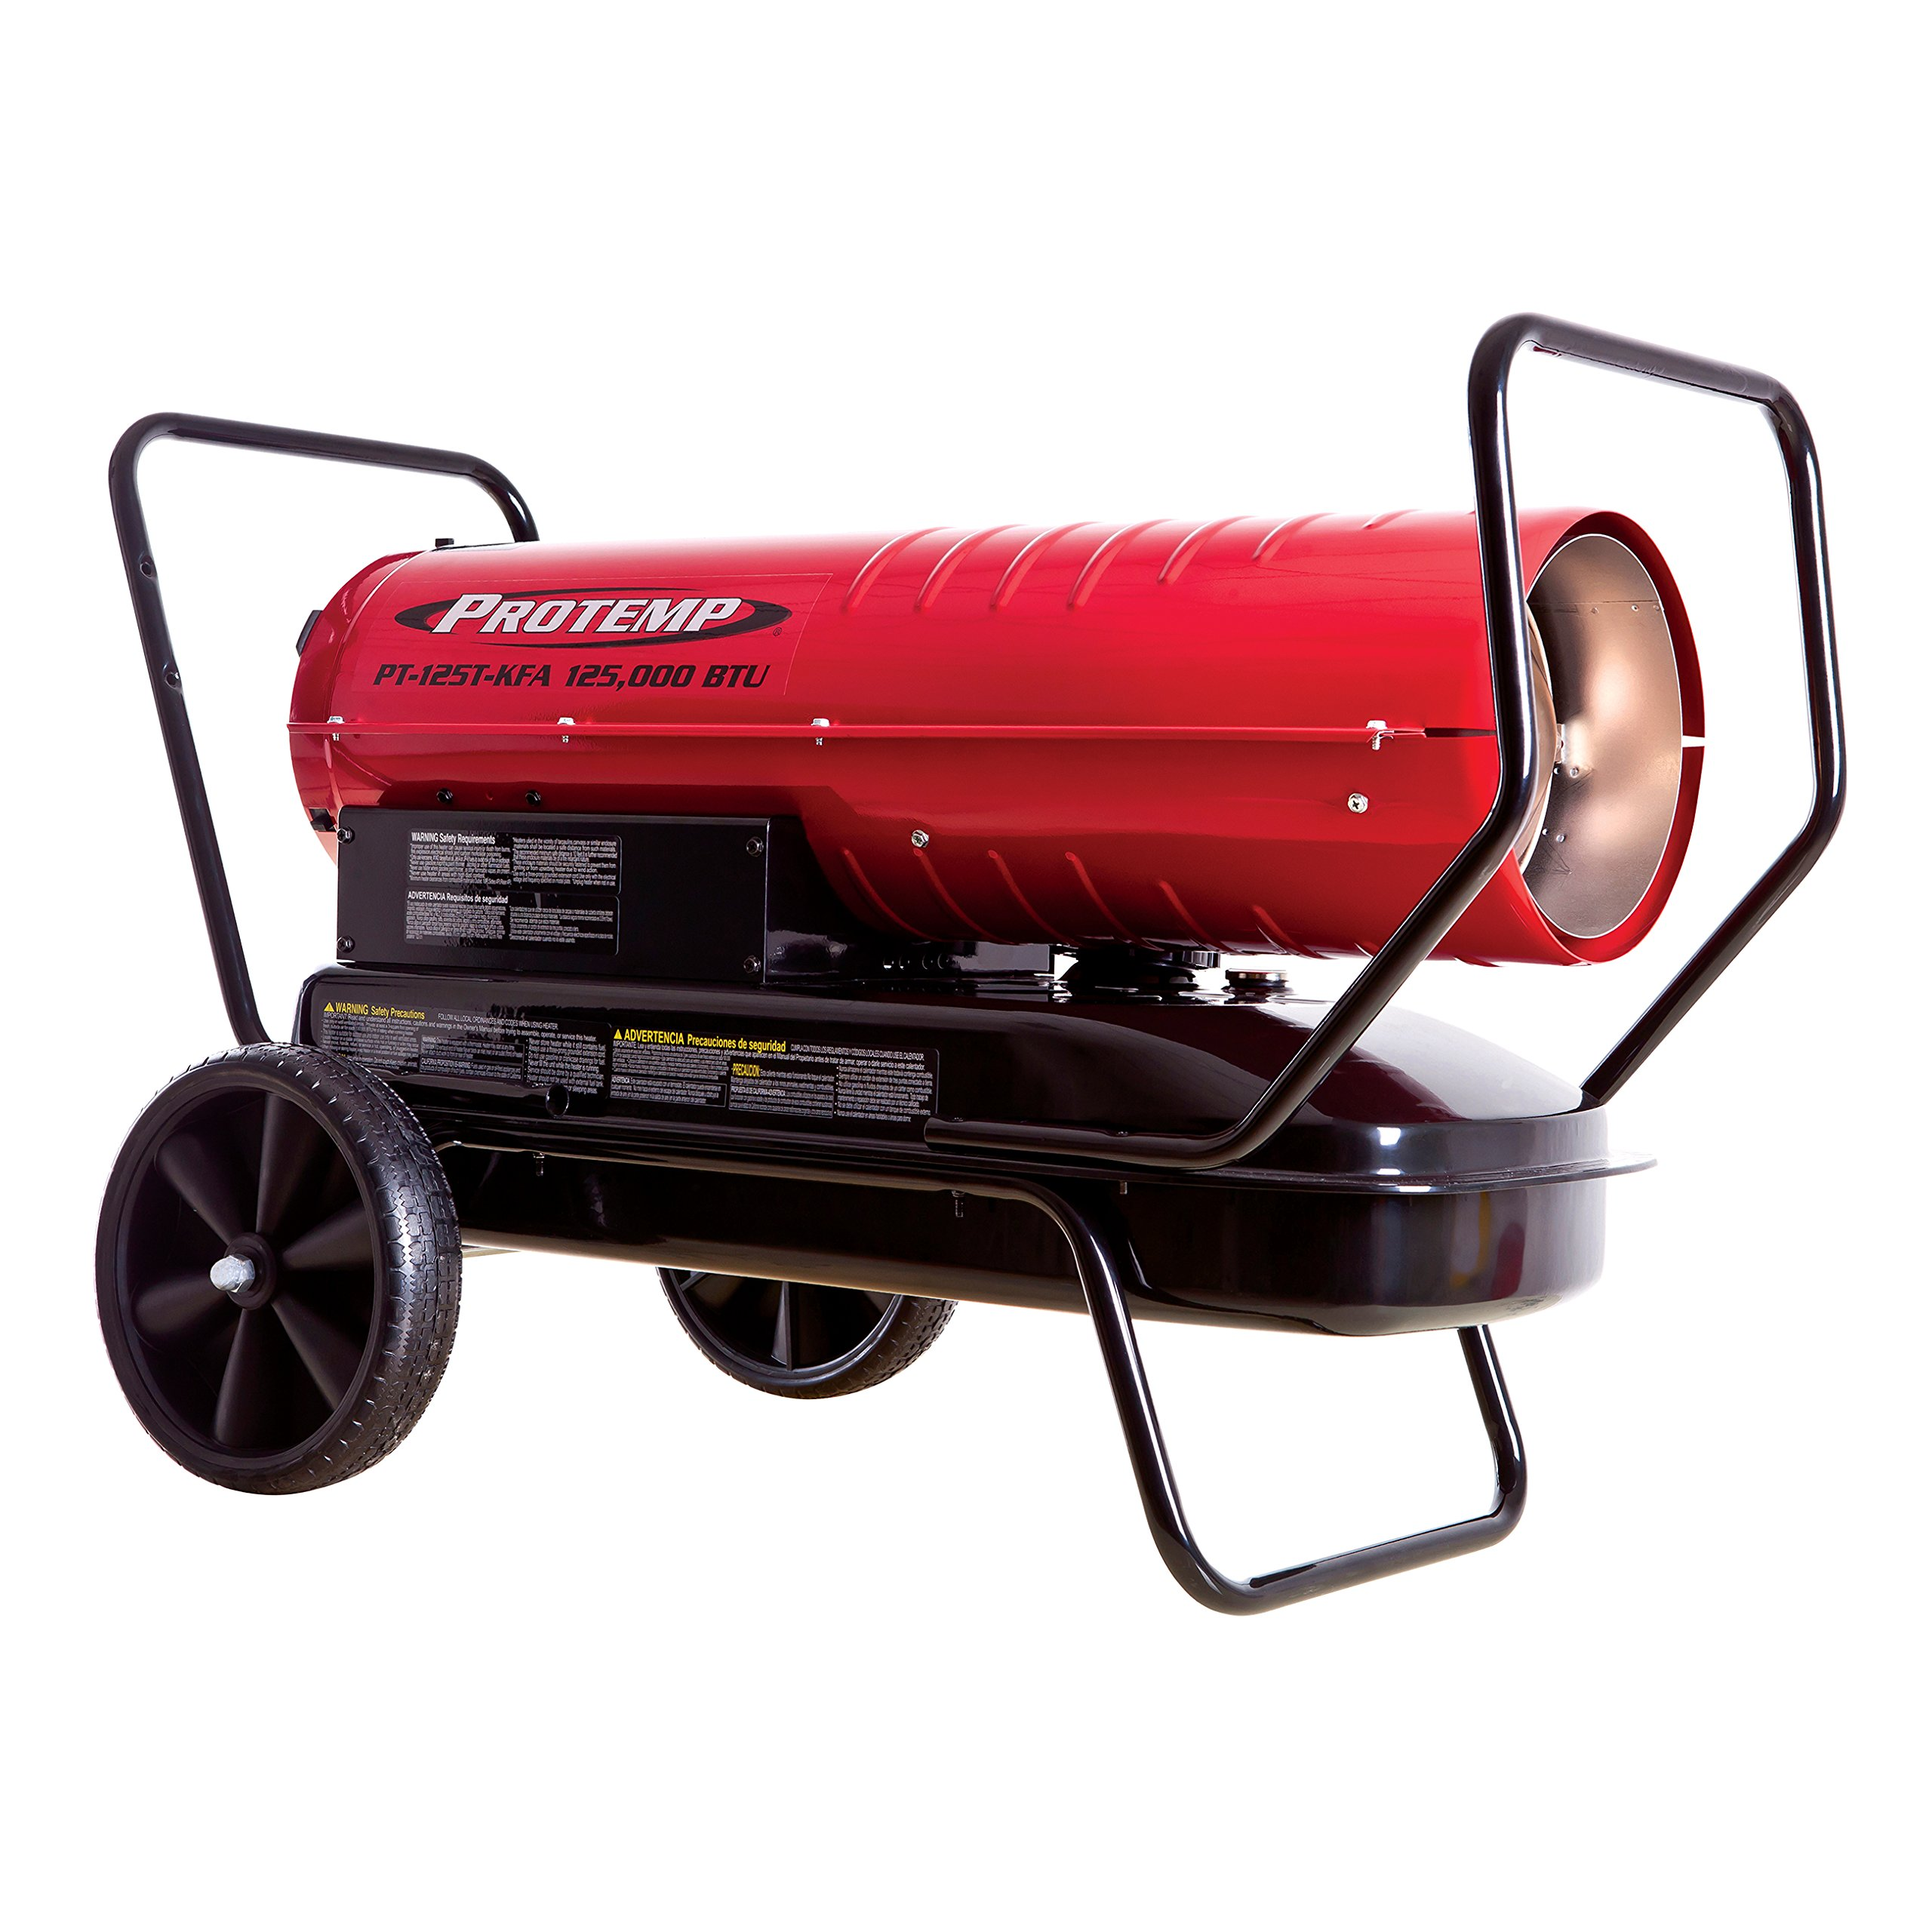 125,000 BTU Kerosene Forced Air Heater with Thermostat